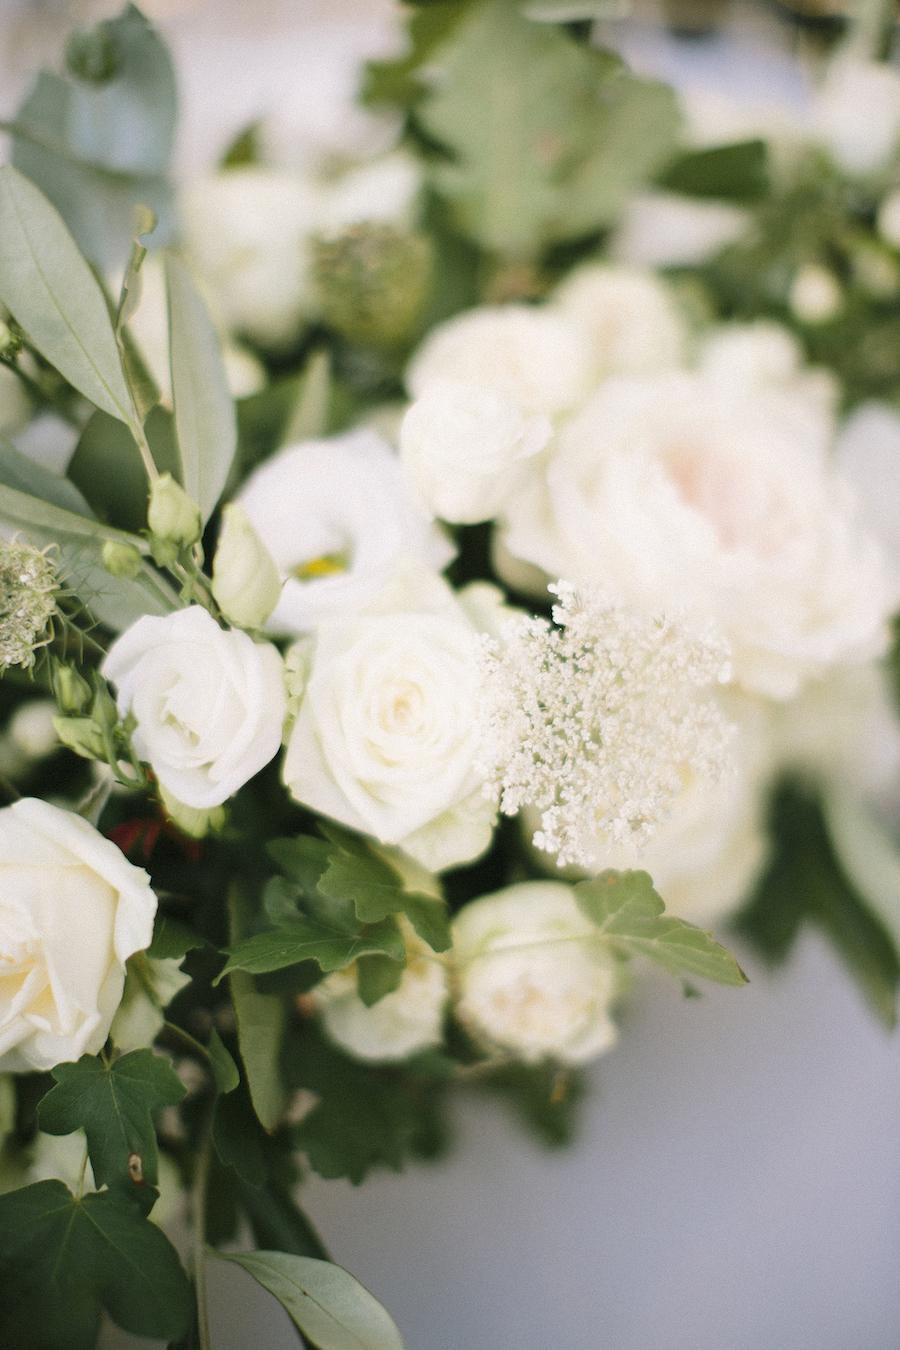 saya-photography-wedding-photographer-provence-chateau-de-robernier-99.jpg